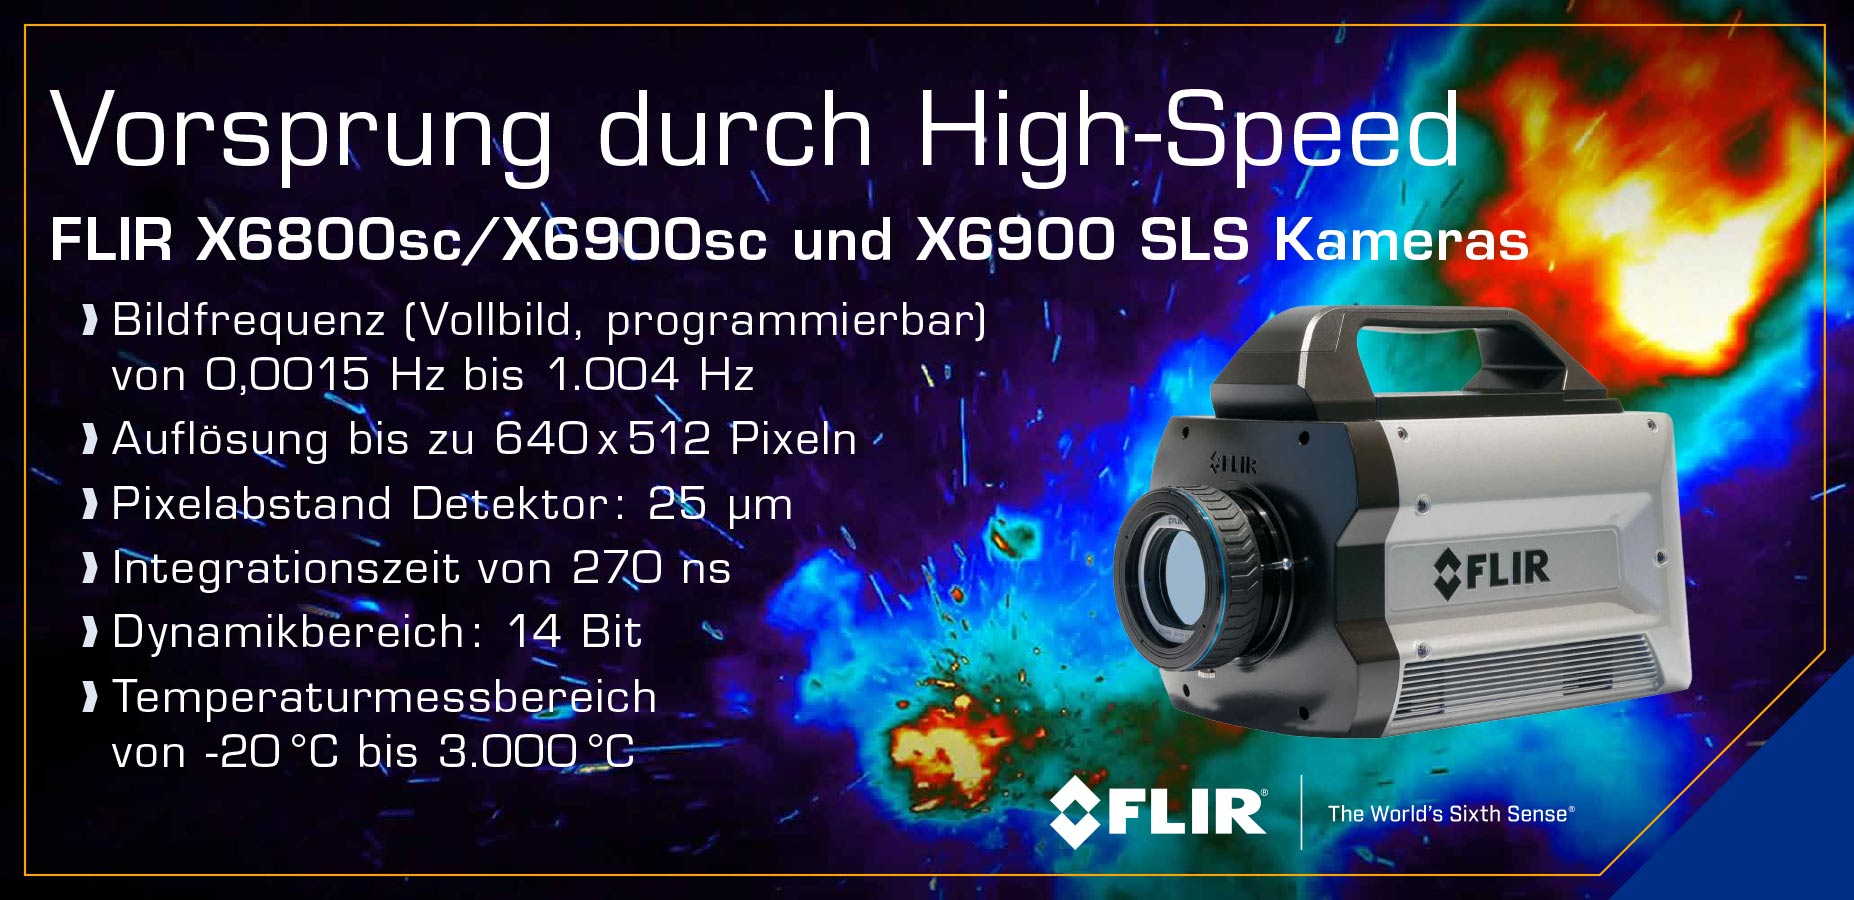 FLIR X6800sc/X6900sc/SLS